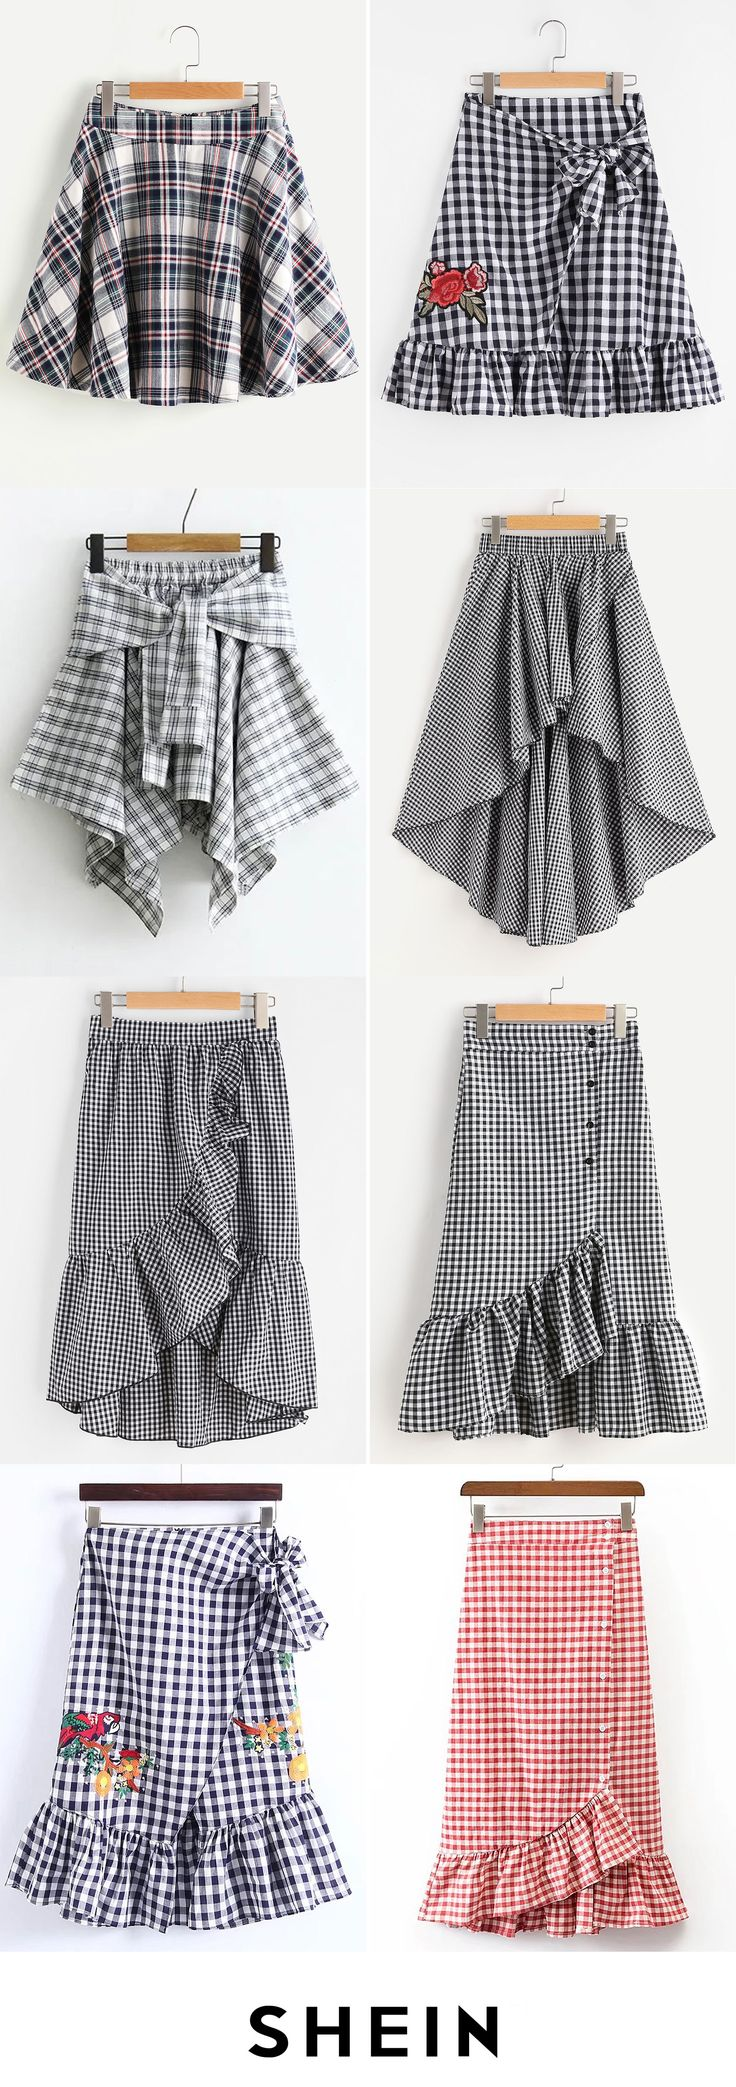 Grid skirts